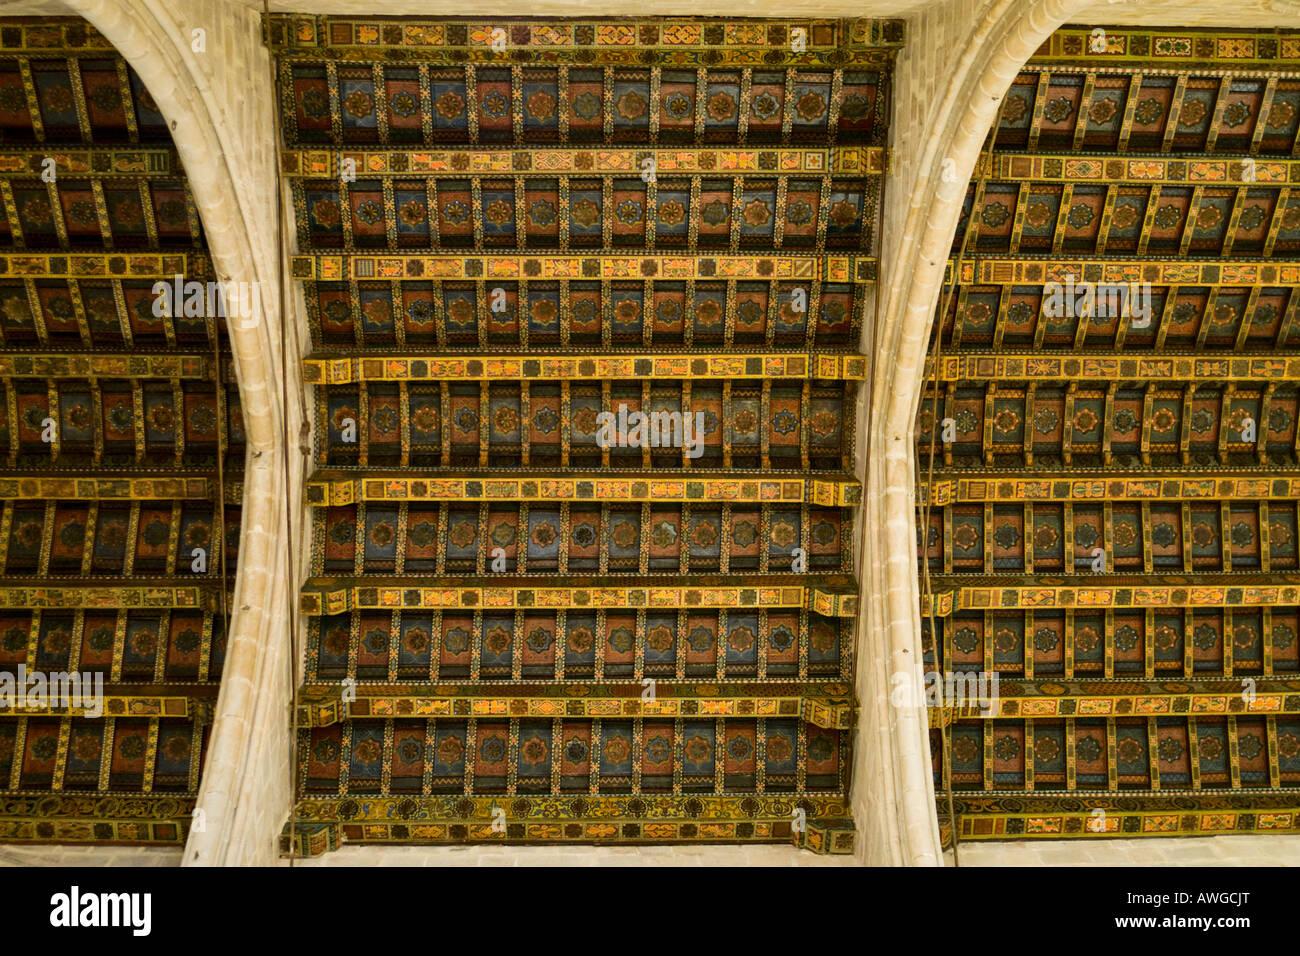 Vault of Capella de Santa Agata at Placa del Rei in Barcelona - Stock Image